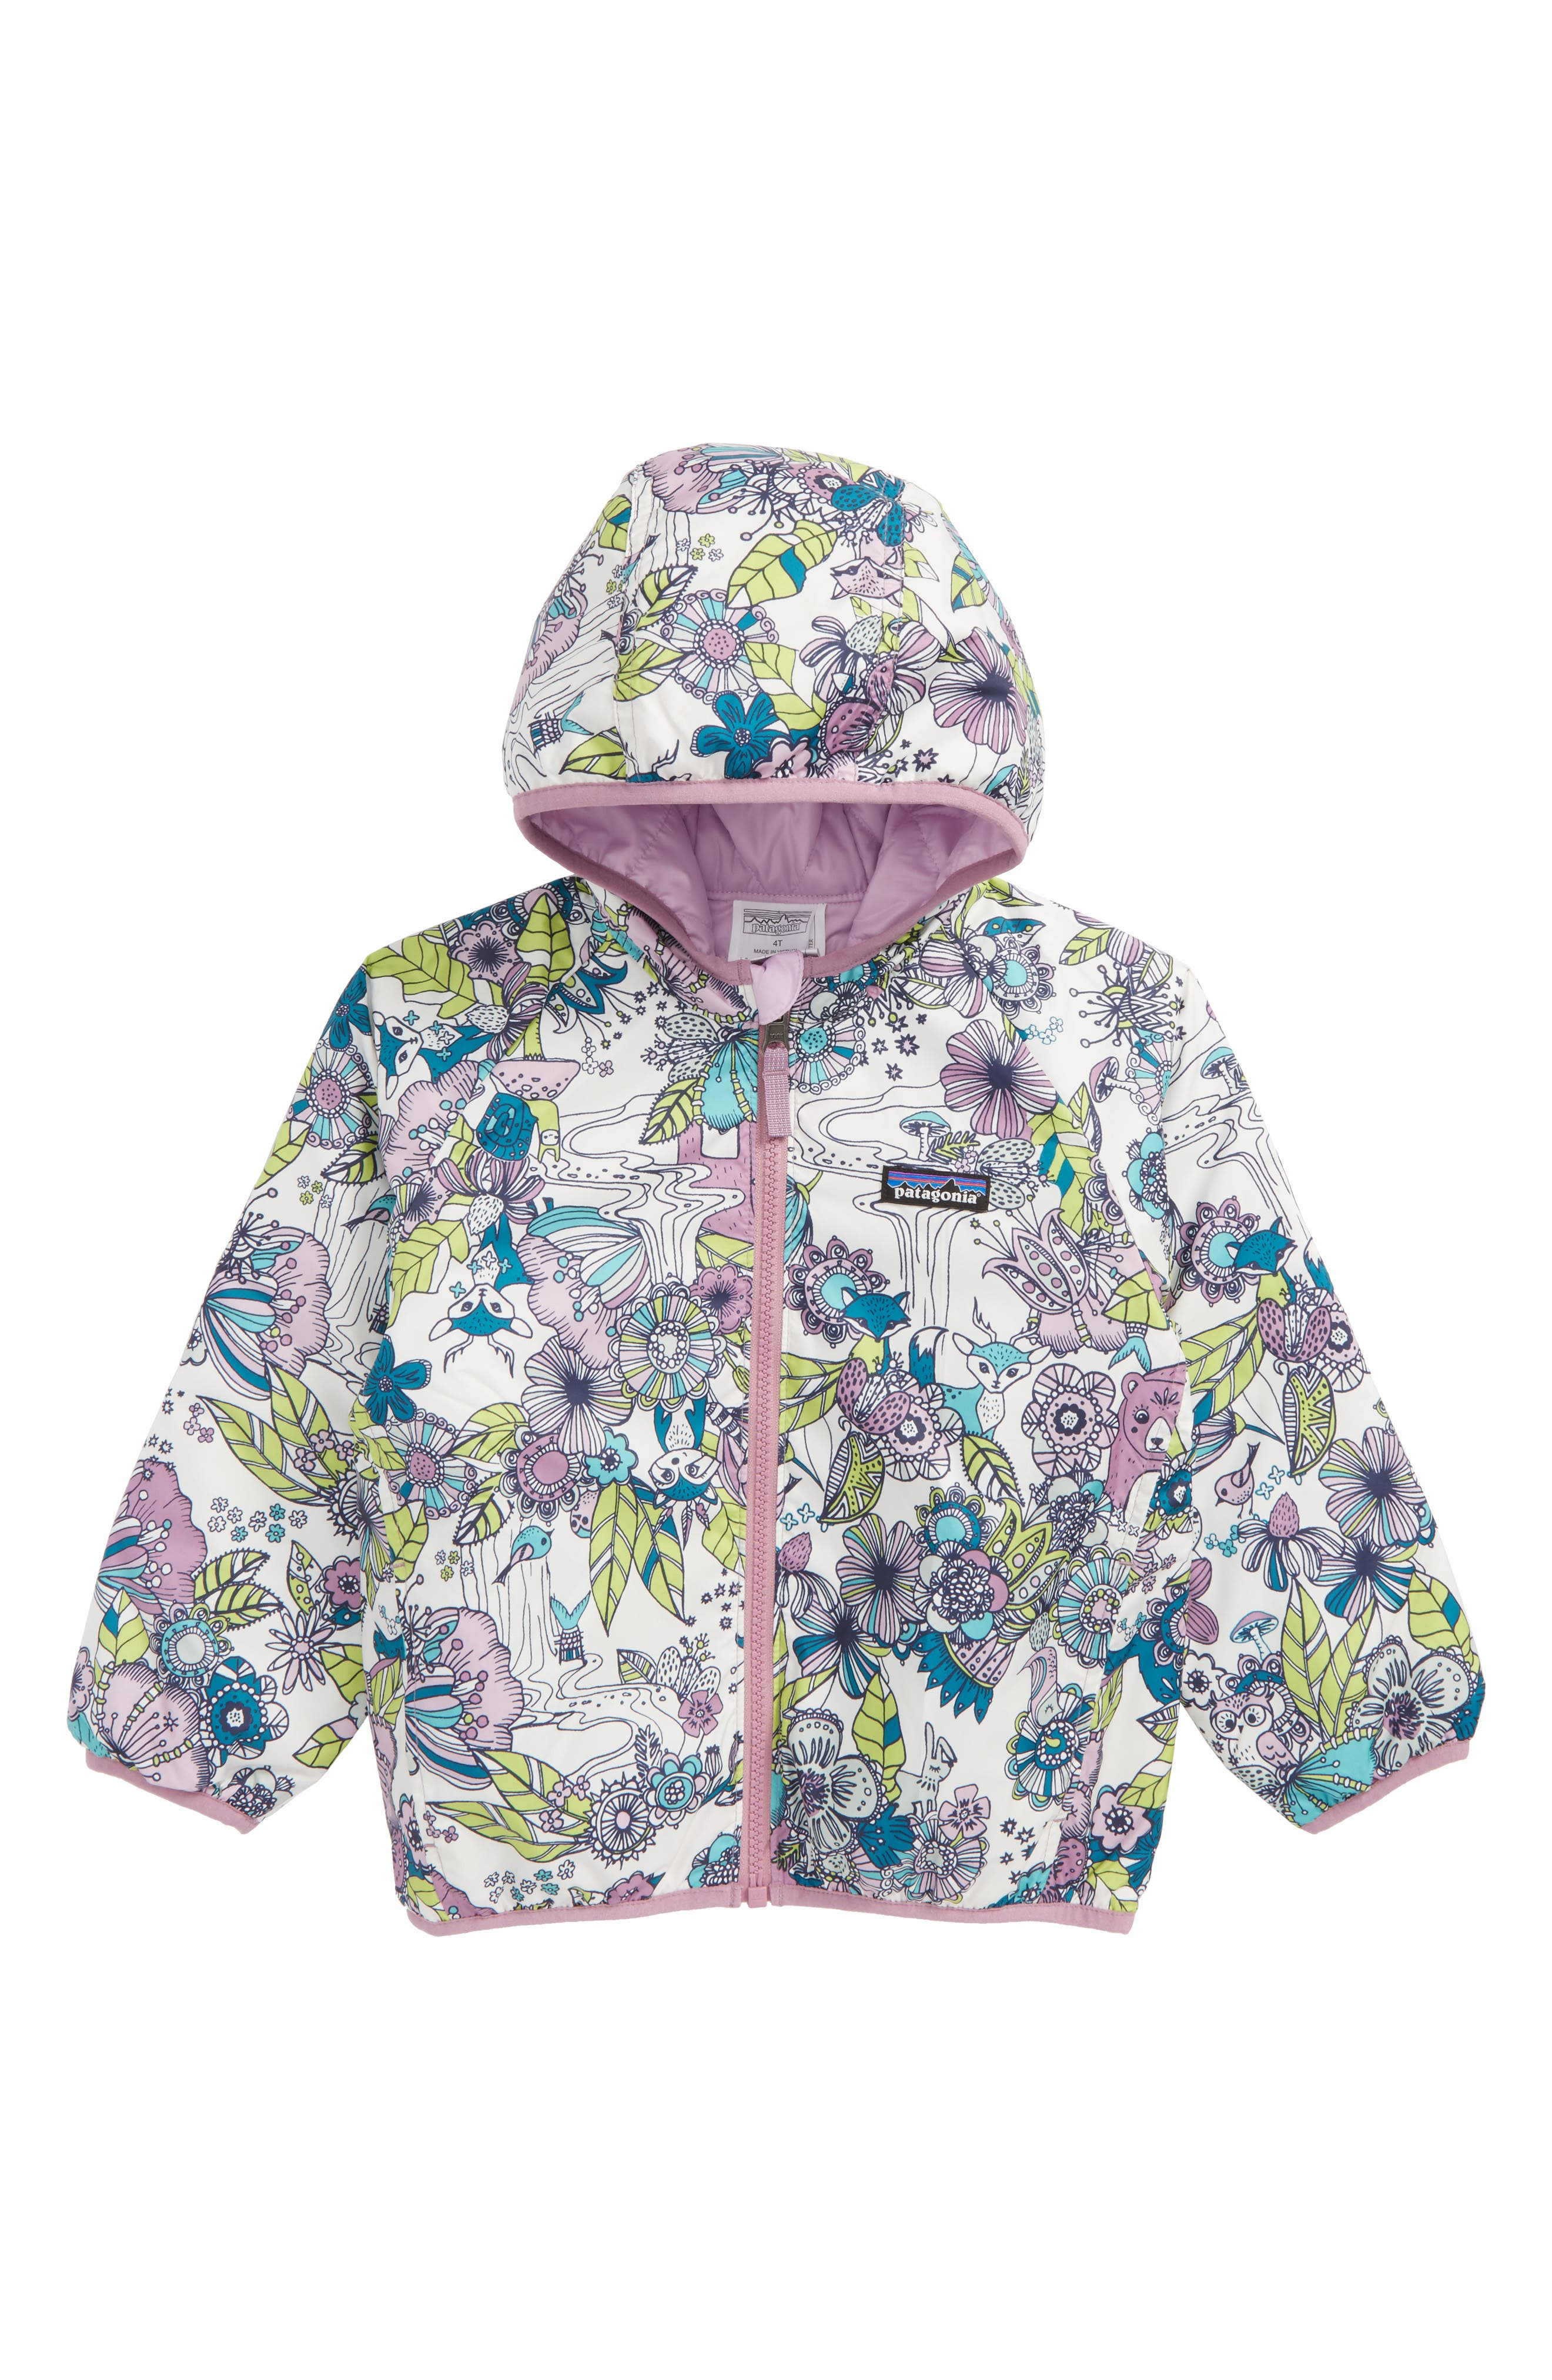 Alternate Image 1 Selected - Patagonia 'Puff-Ball' Water Resistant Reversible Hooded Jacket (Toddler Girls)